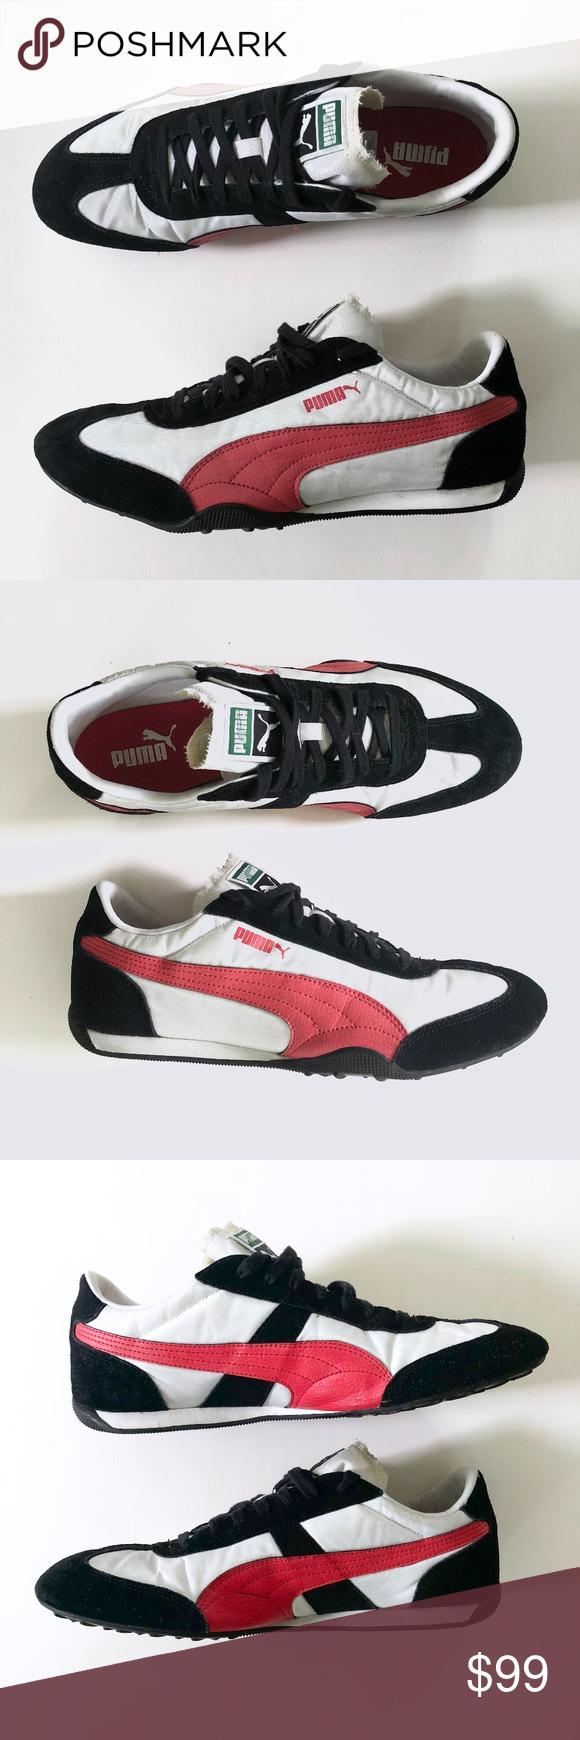 44b3f89f058c Vintage Puma Sprint Retro Sneakers Size 12 Up for sale awesome Vintage Puma  Sprint Retro Sneakers